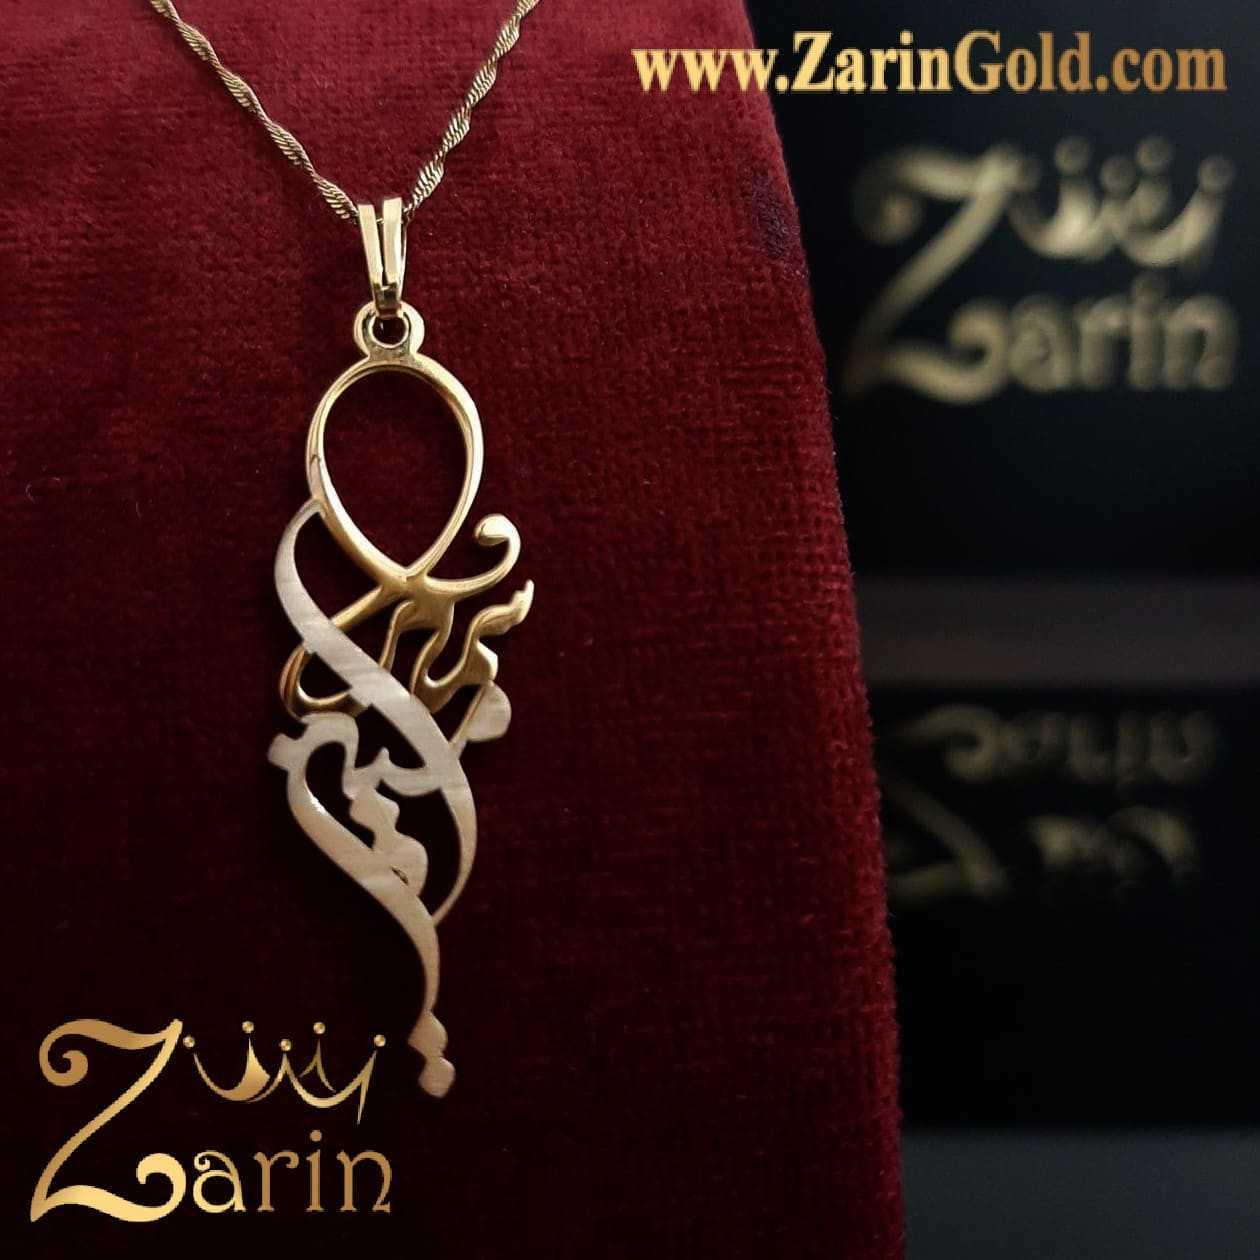 پلاک طلا دو اسم فارسی سمیرا امیر